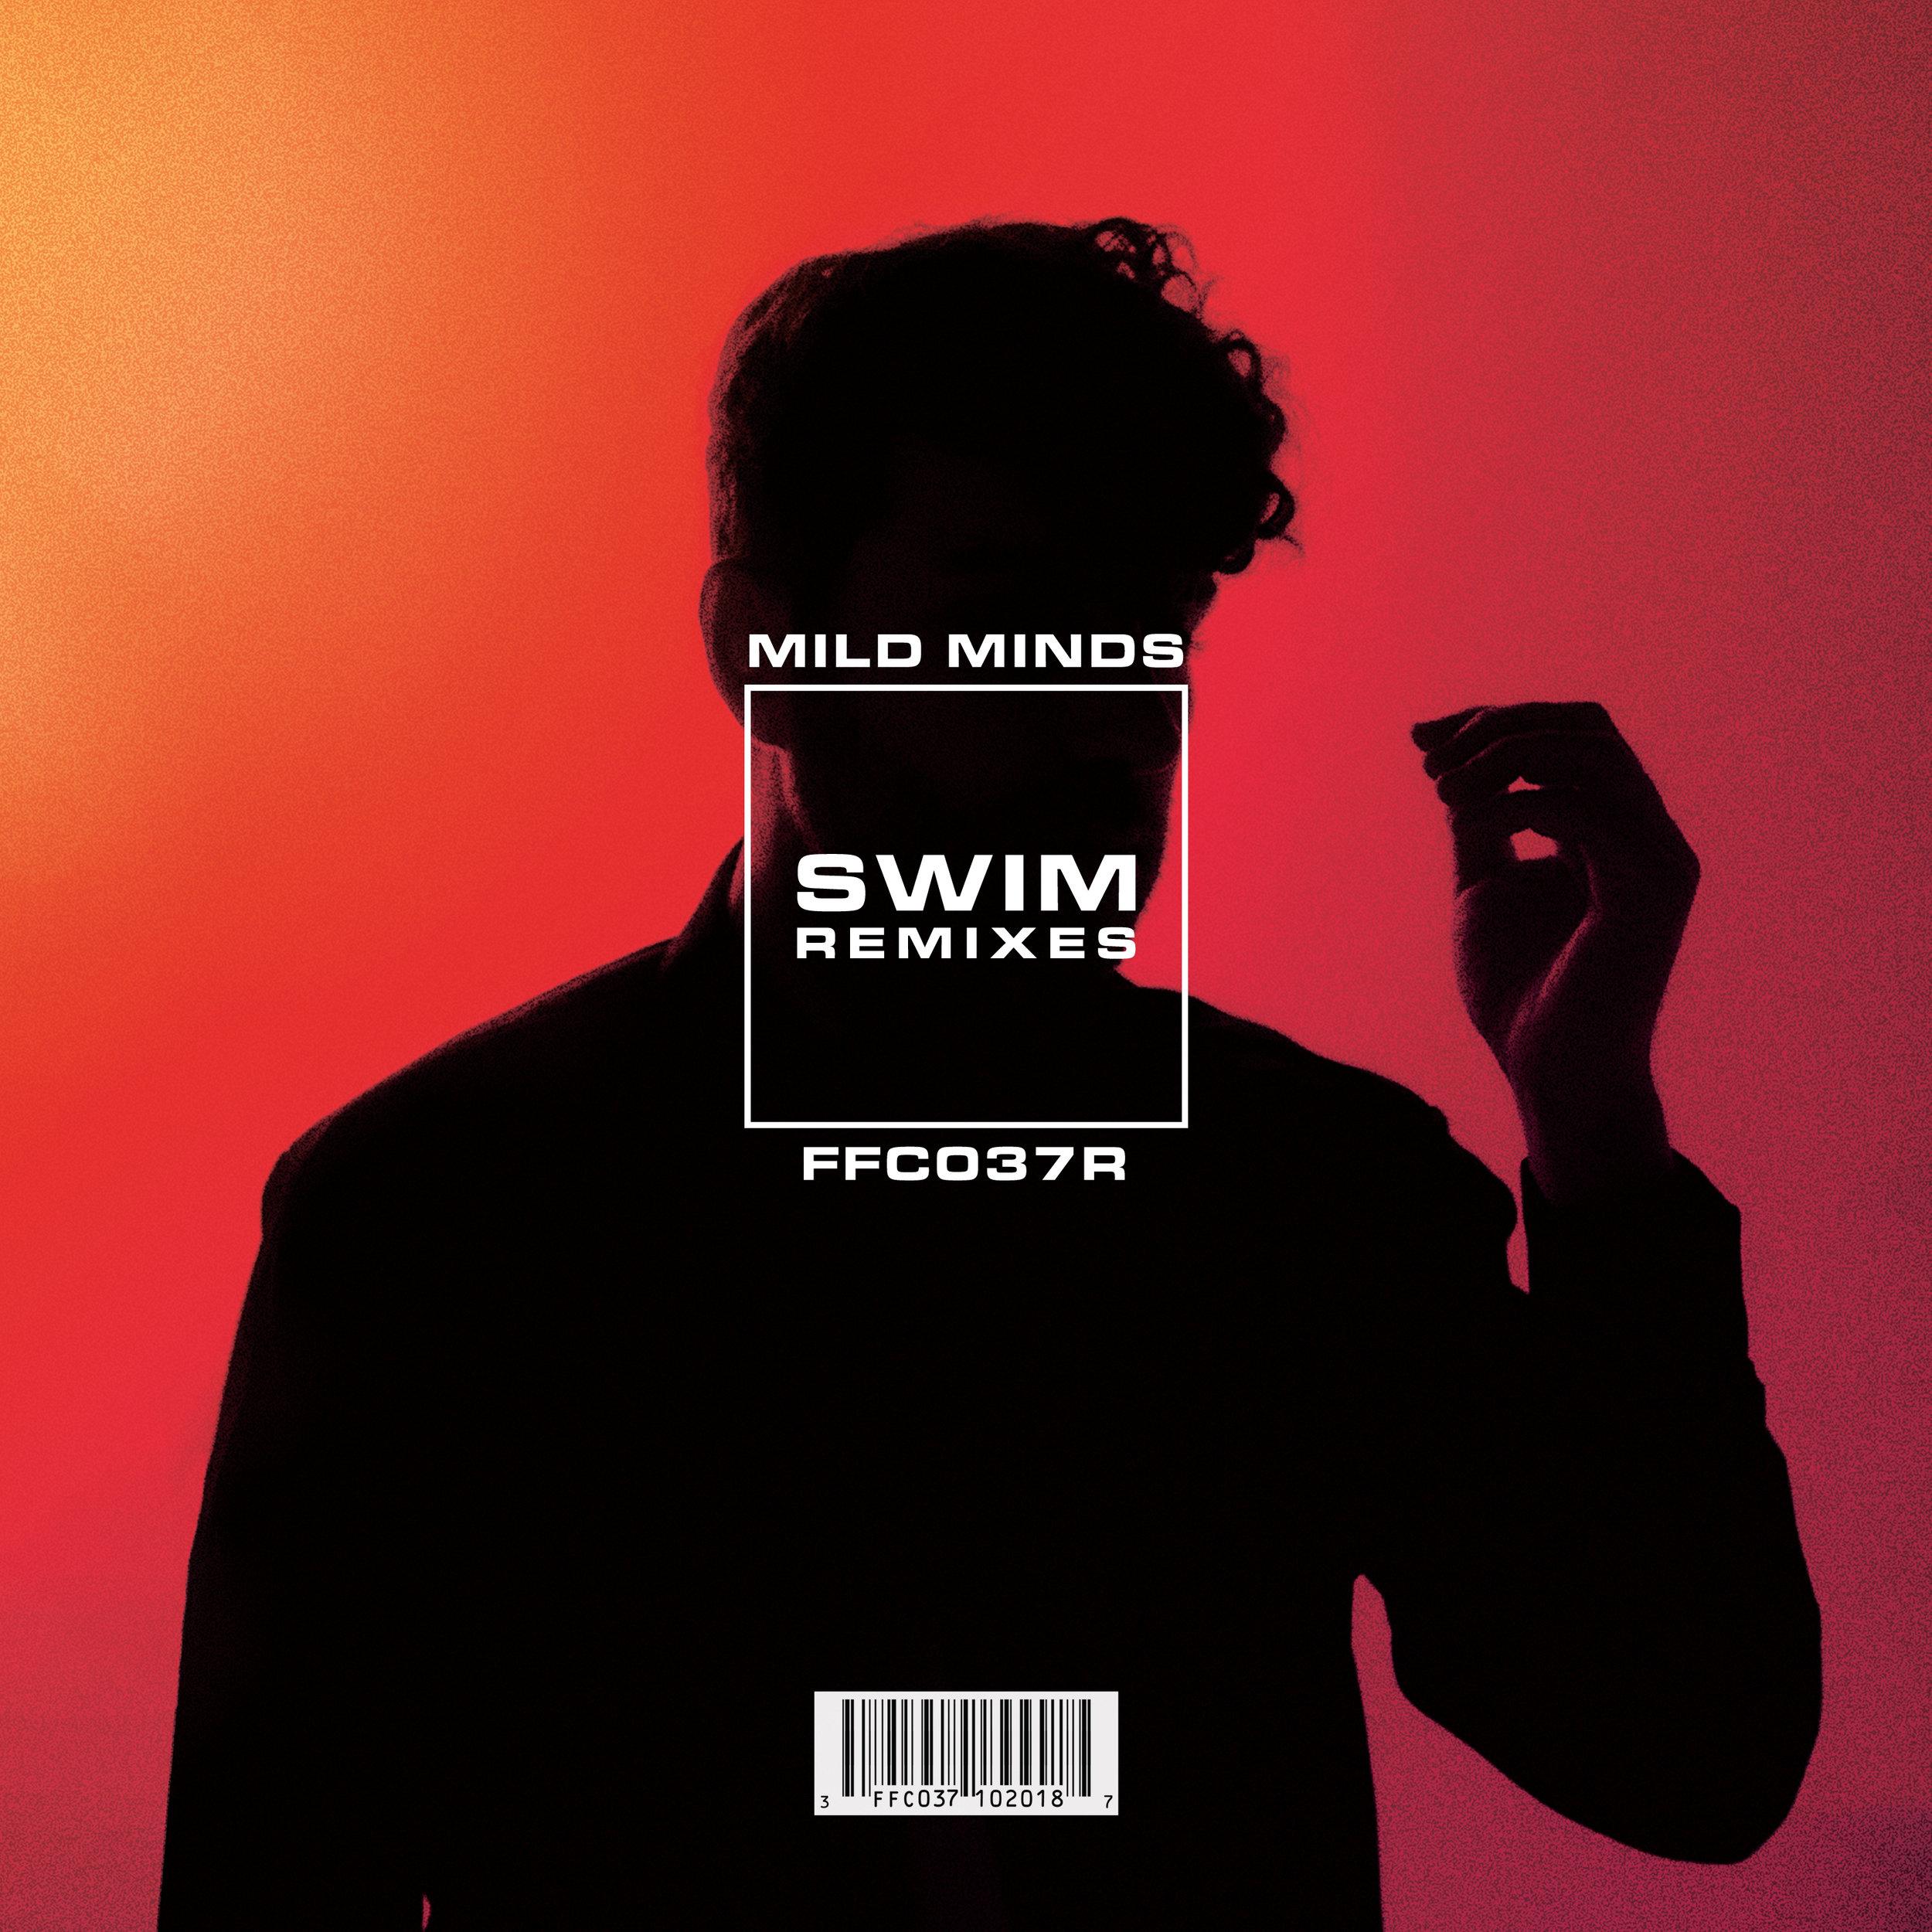 FFC037R-Mild-Minds-Swim-Remixes-Master-Art-3000px.jpg